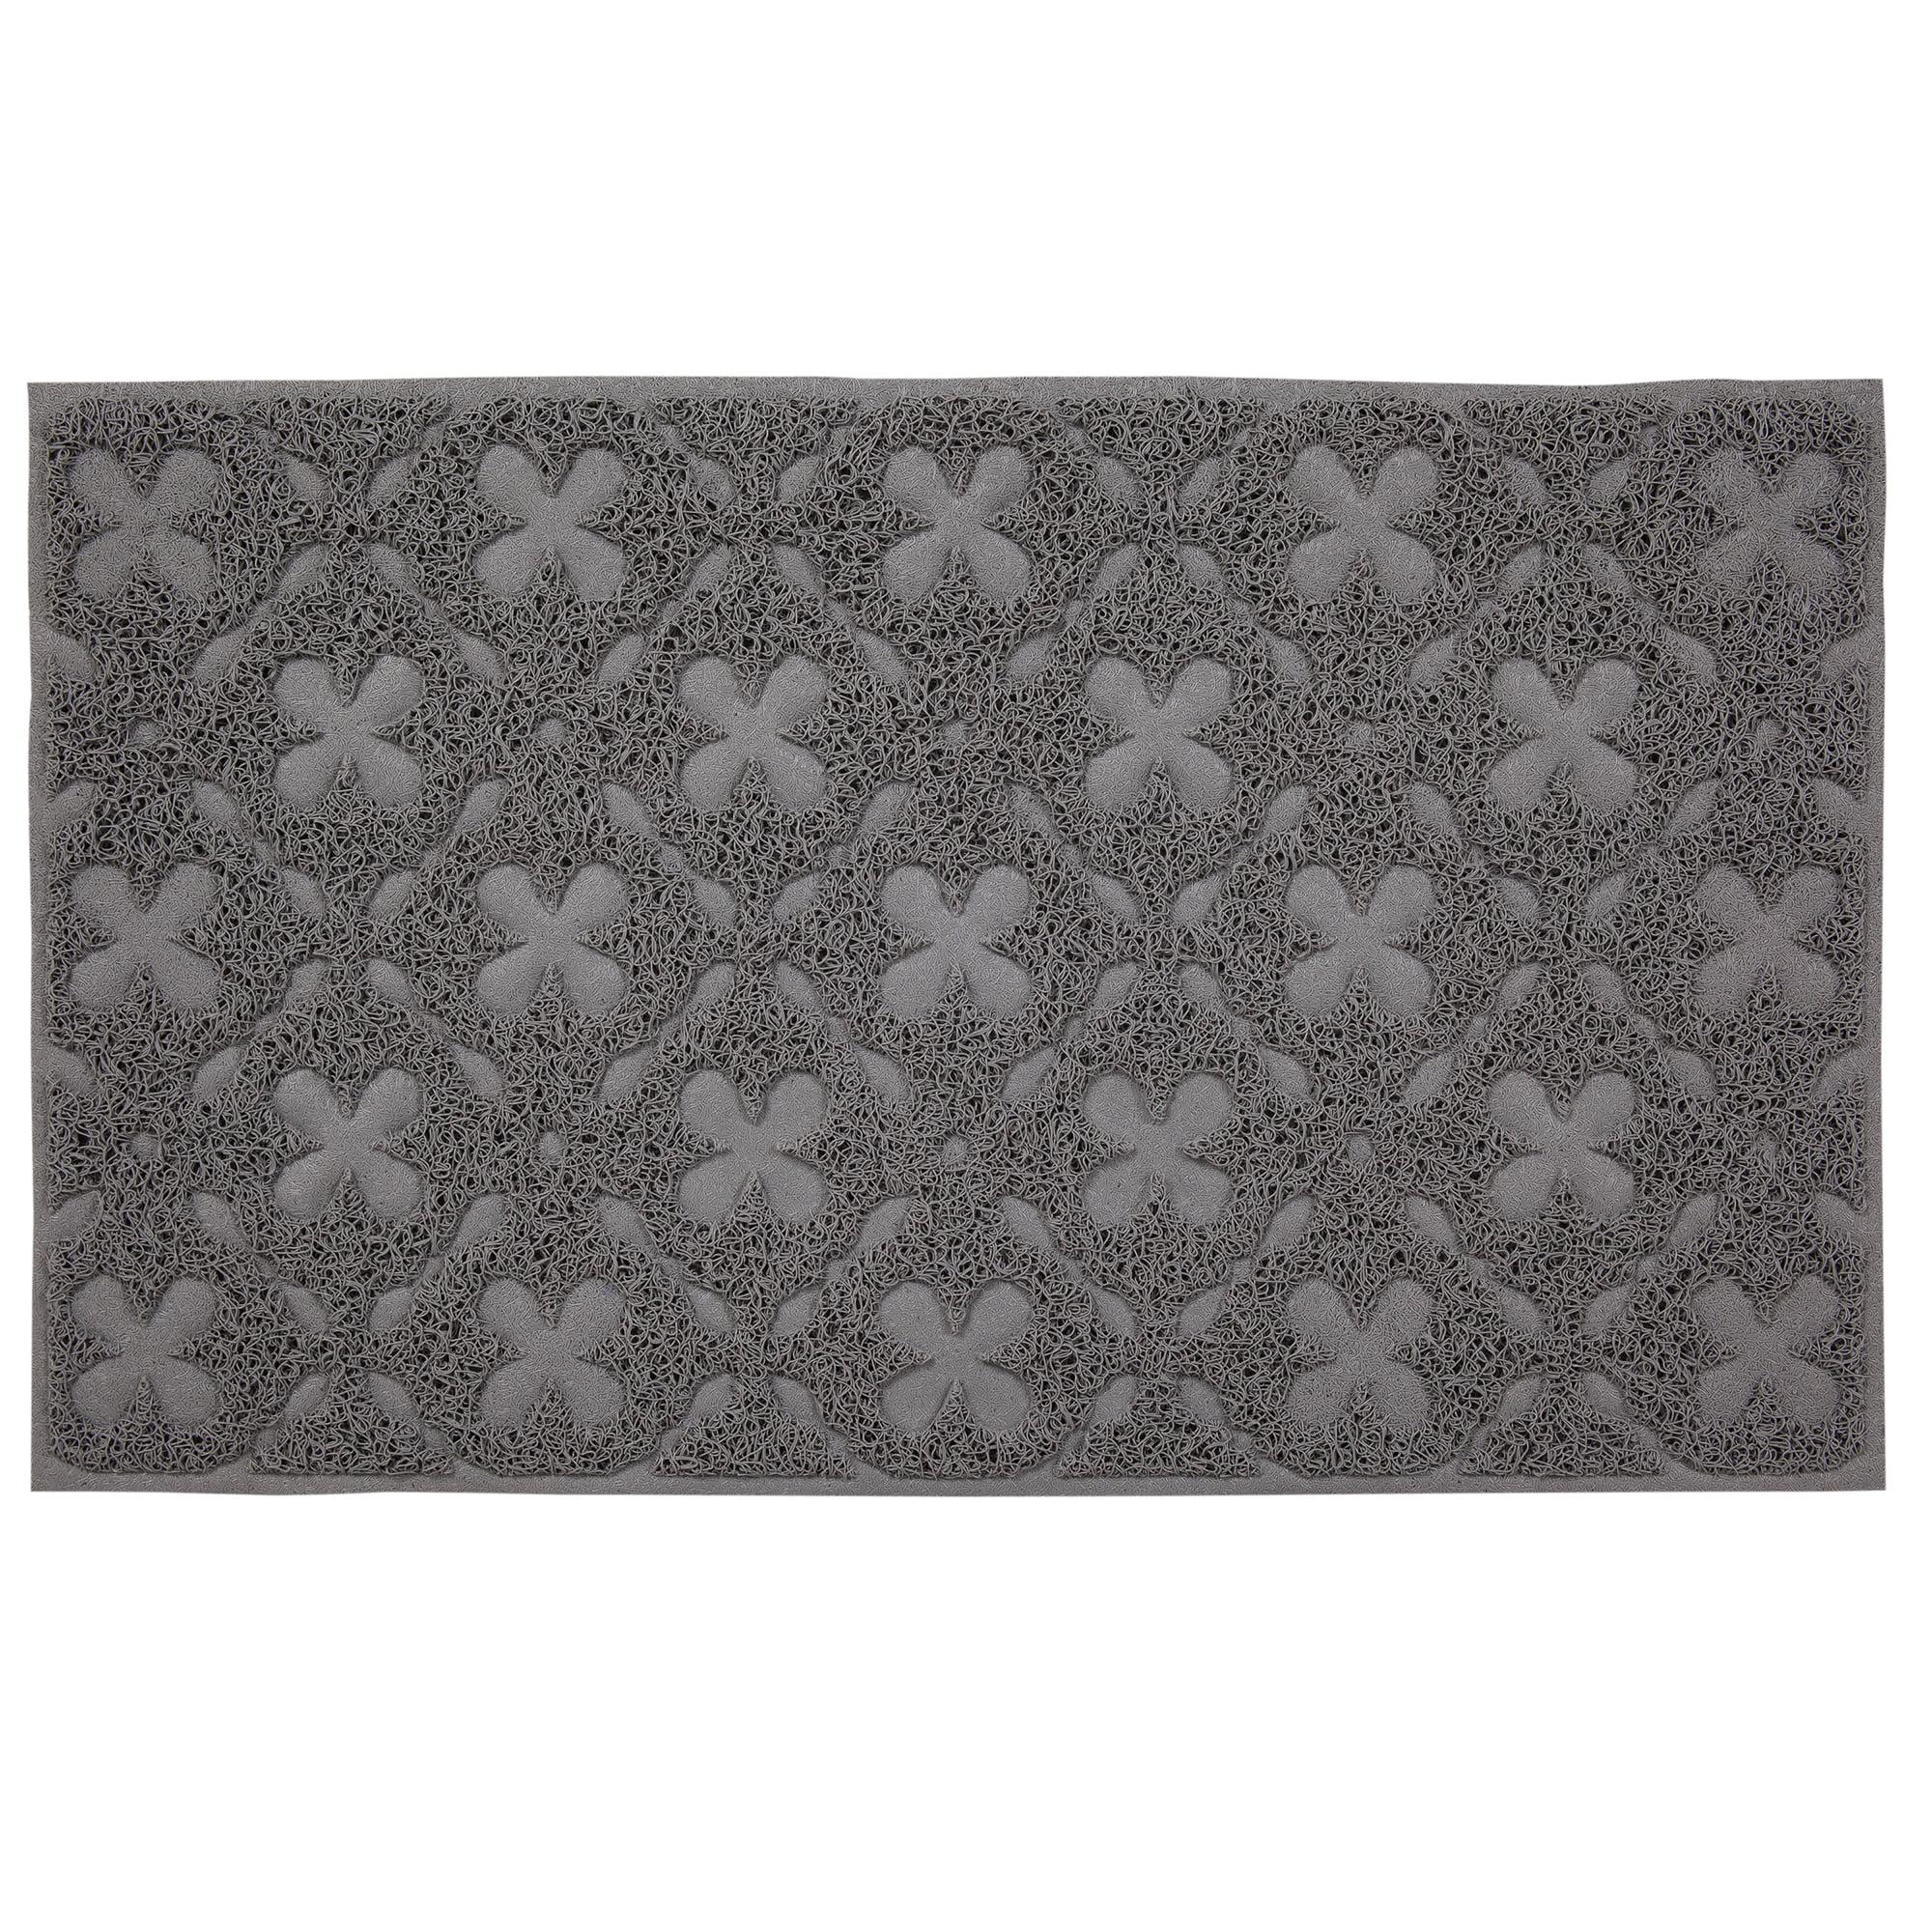 Best Rug To Catch Cat Litter Carpet Vidalondon